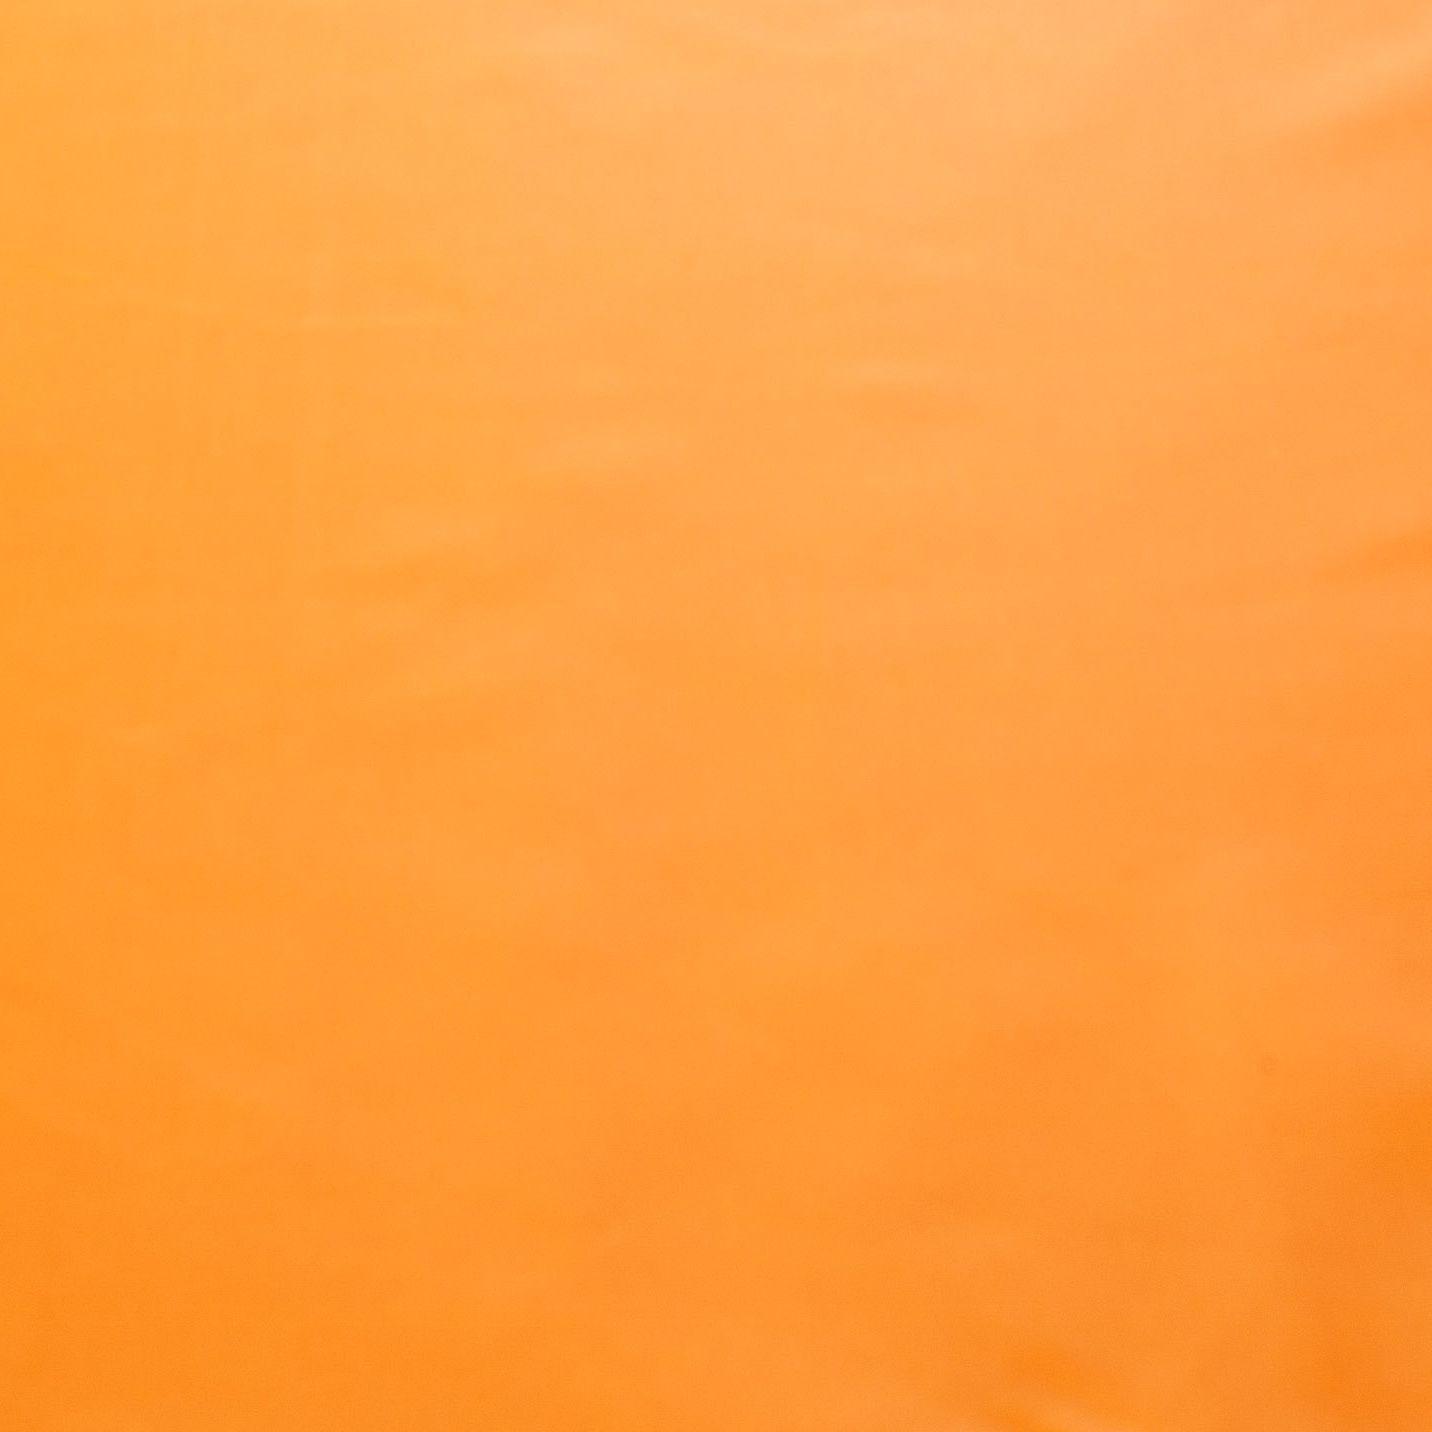 Tecido Bember 100% Poliester 1,50 Mt Largura Abobora Neon